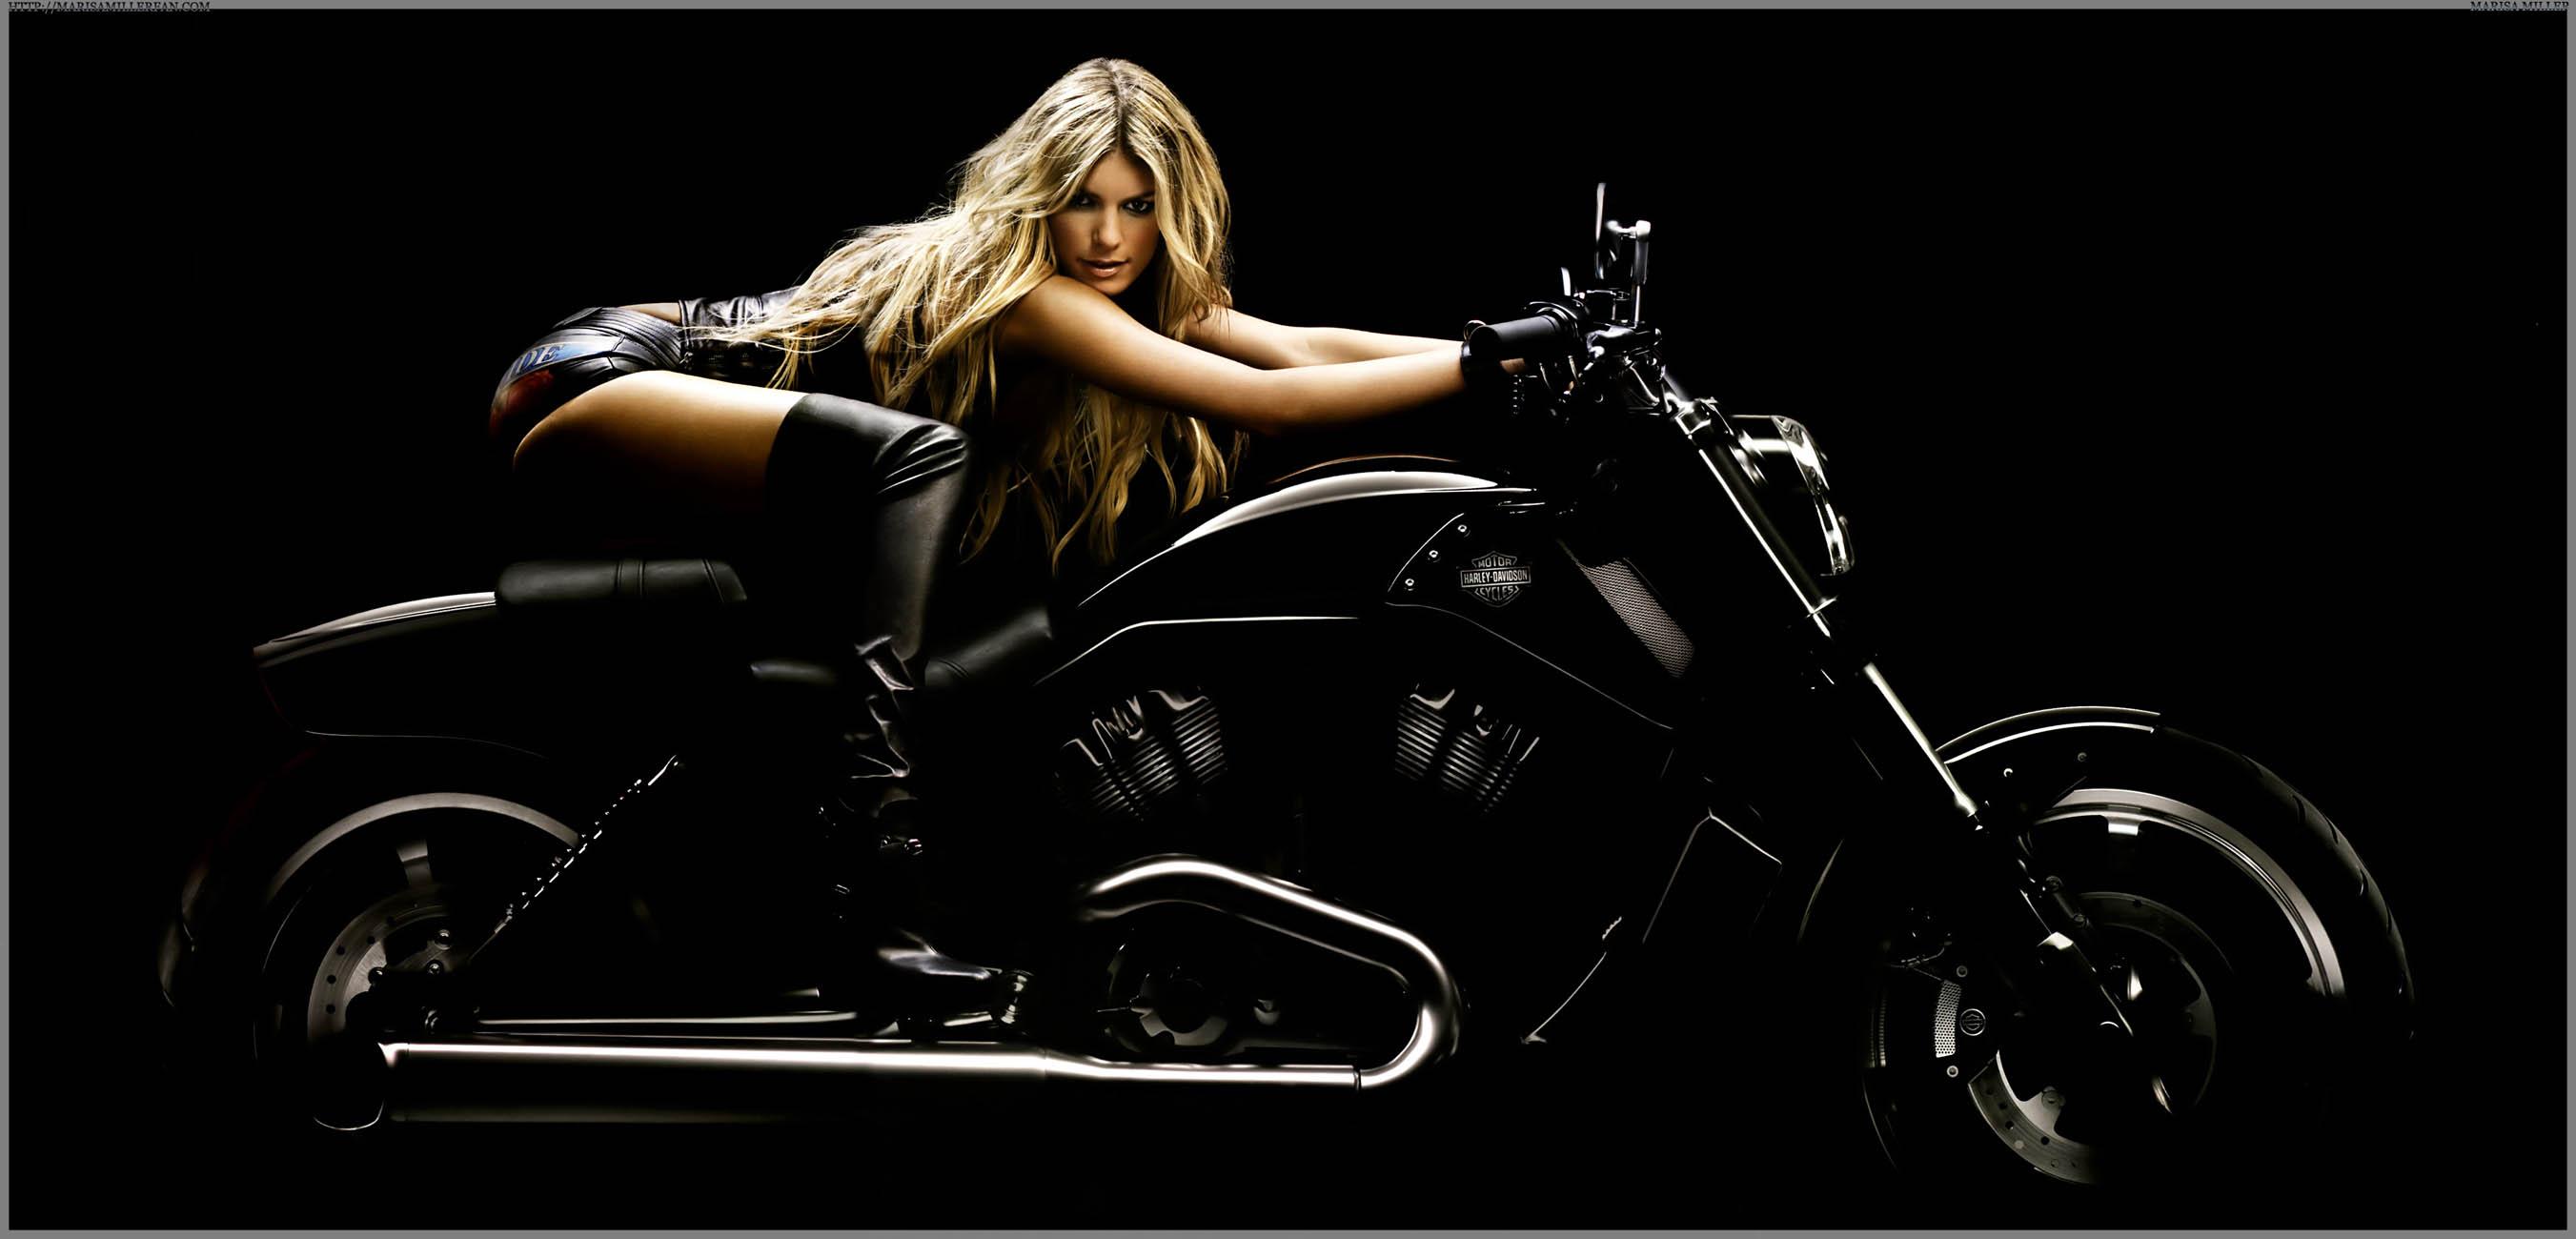 Harley Davidson: Digitalminx.com